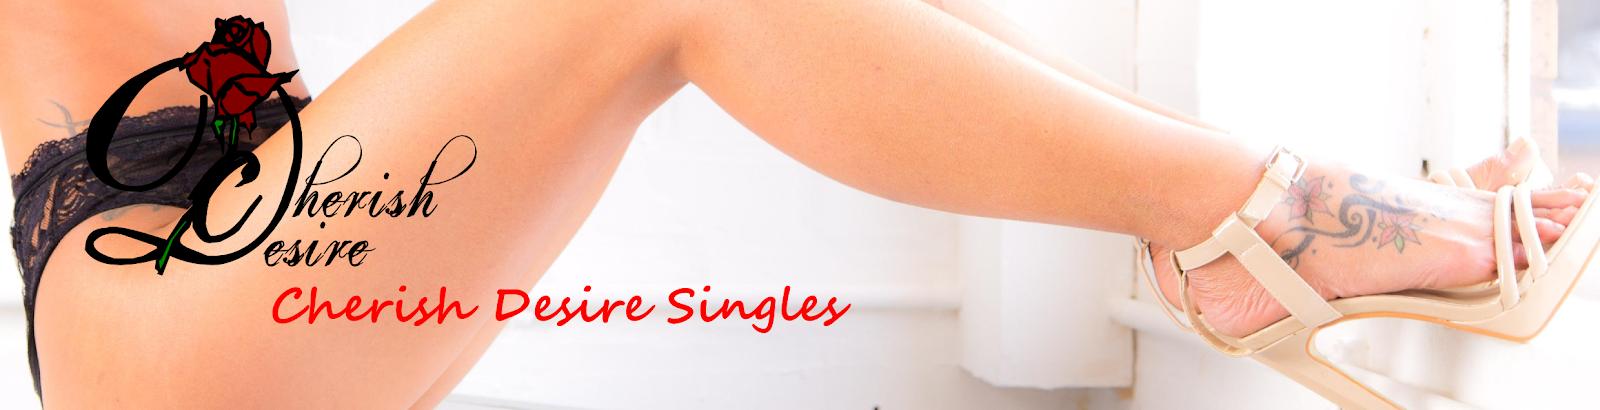 Cherish Desire Singles, Max D, erotica